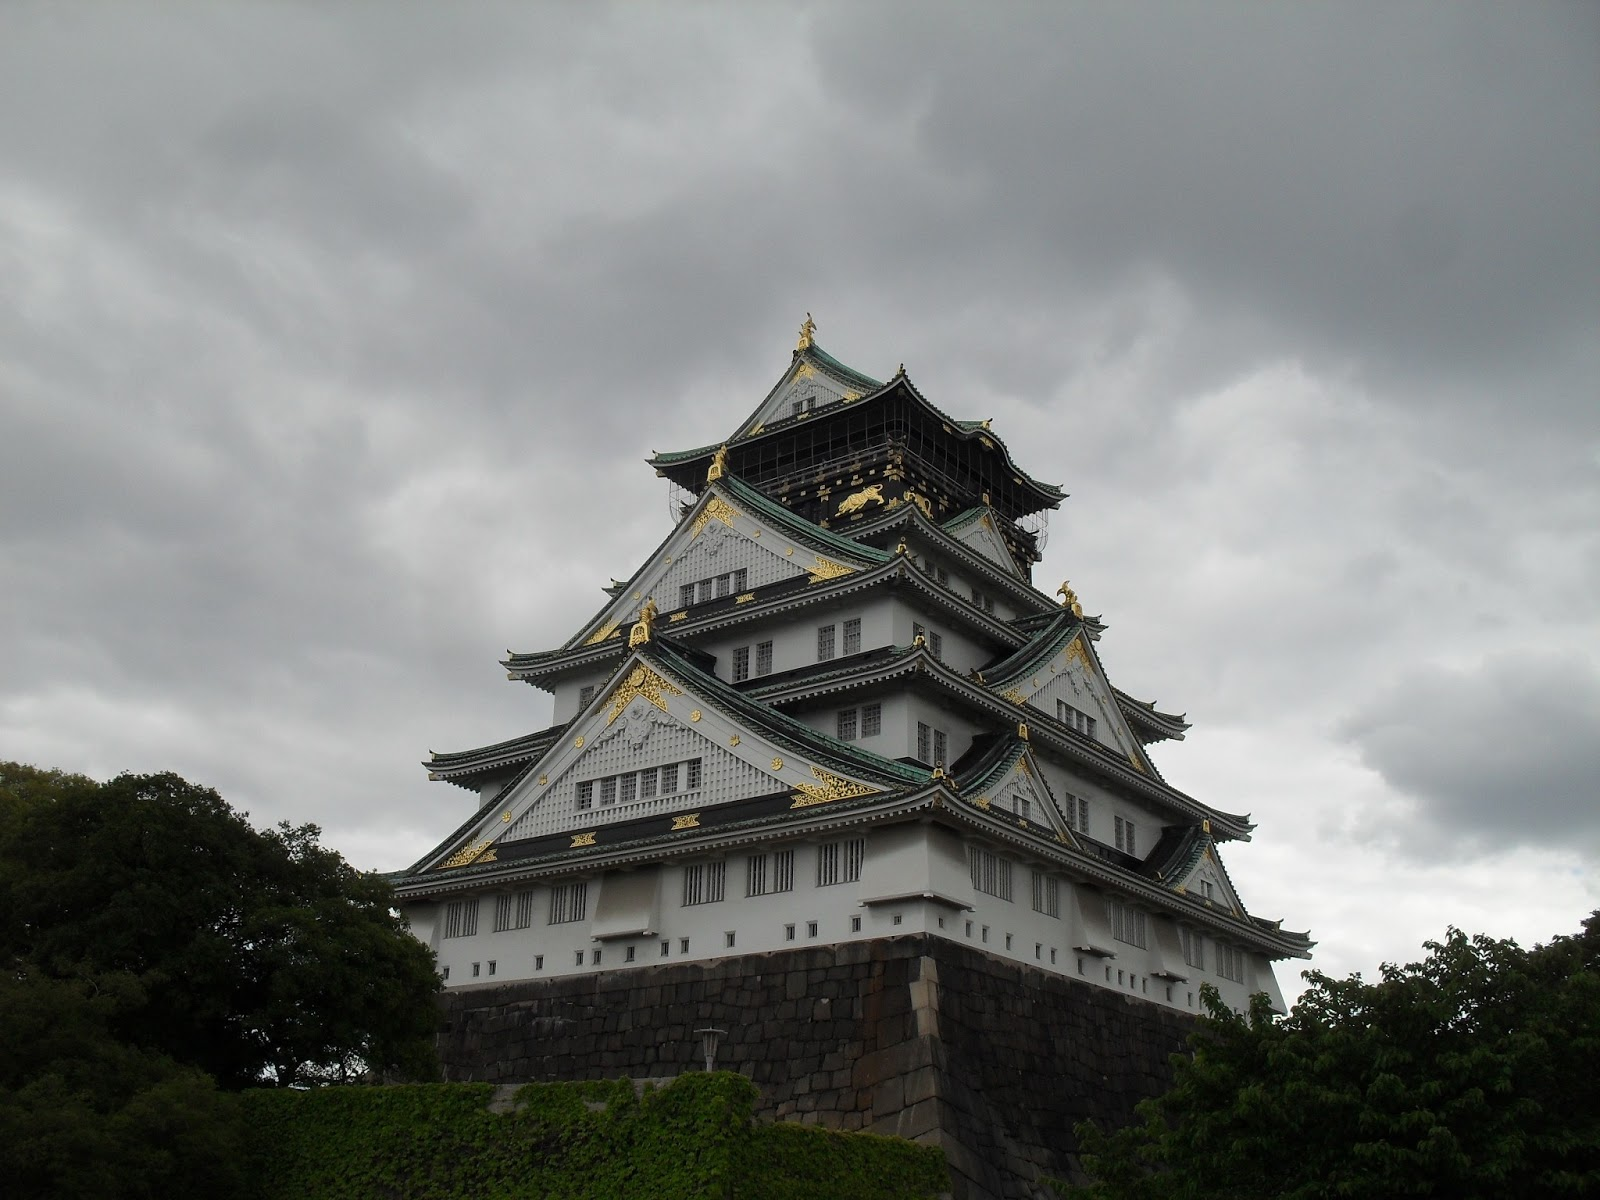 Man in Japan: A trip to Osaka Castle